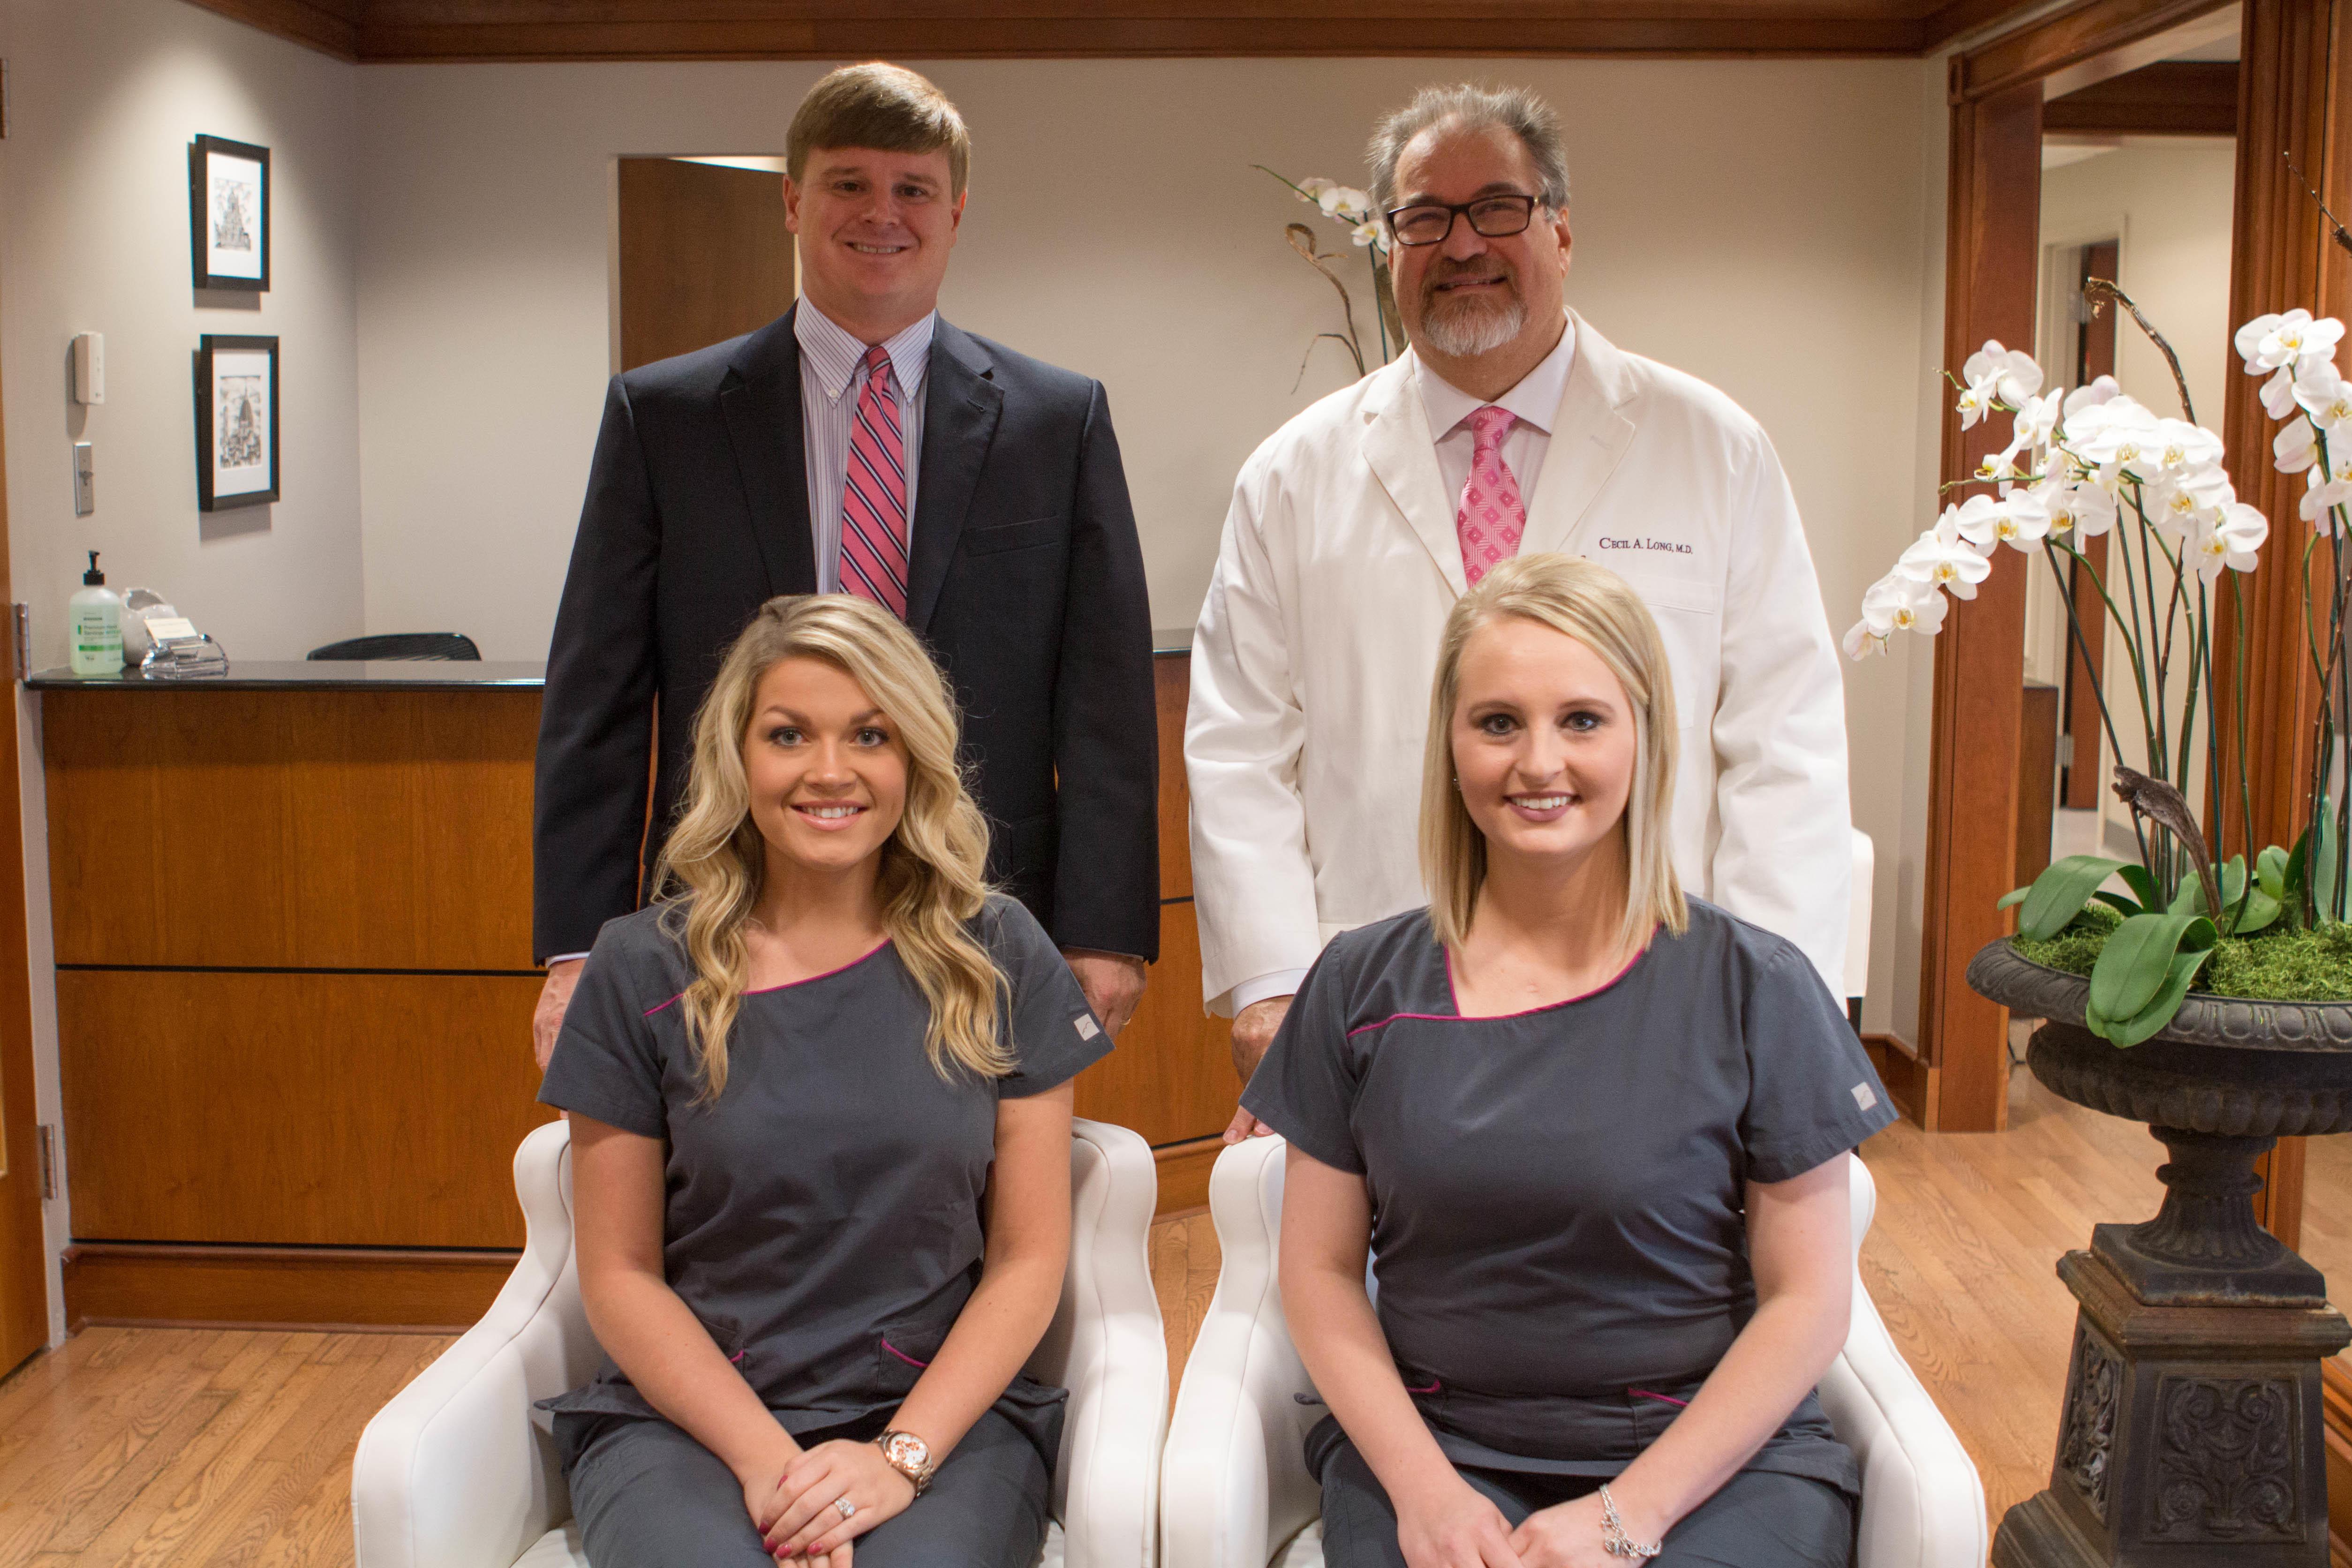 America Institute of Reproductive Medicine - Alabama